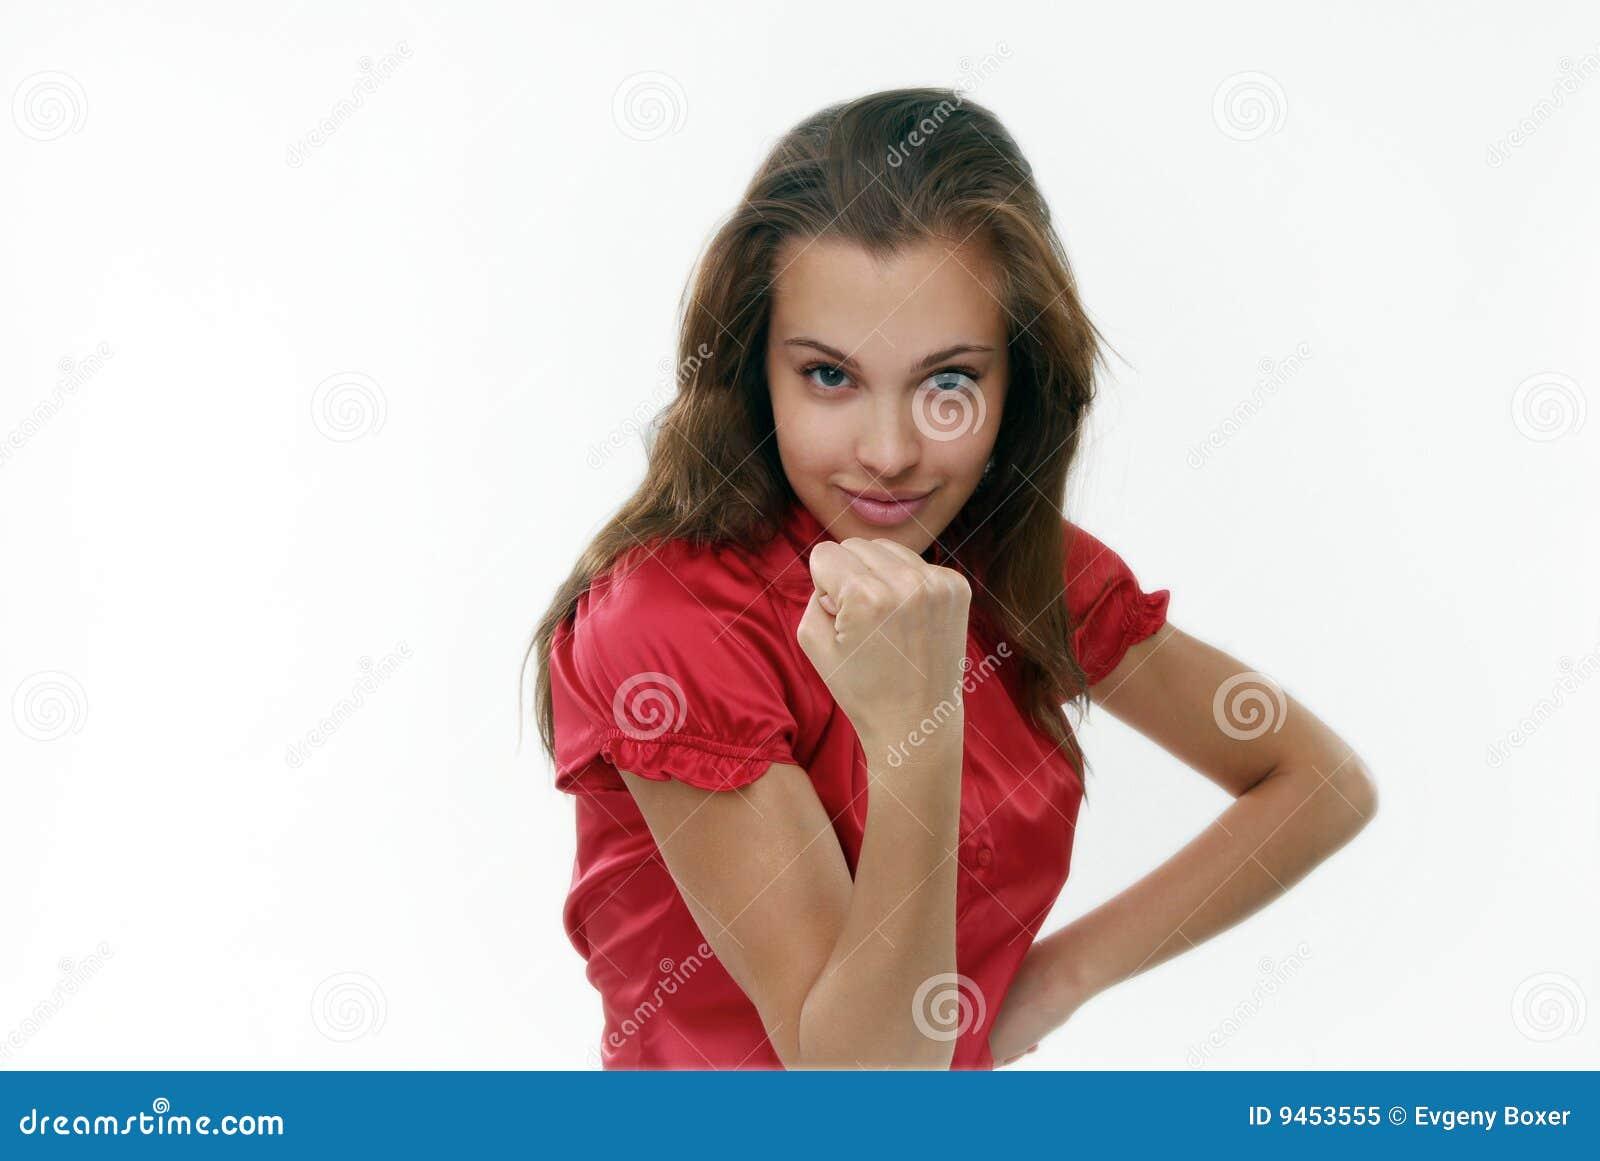 Девочка с кулочком фото фото 254-316